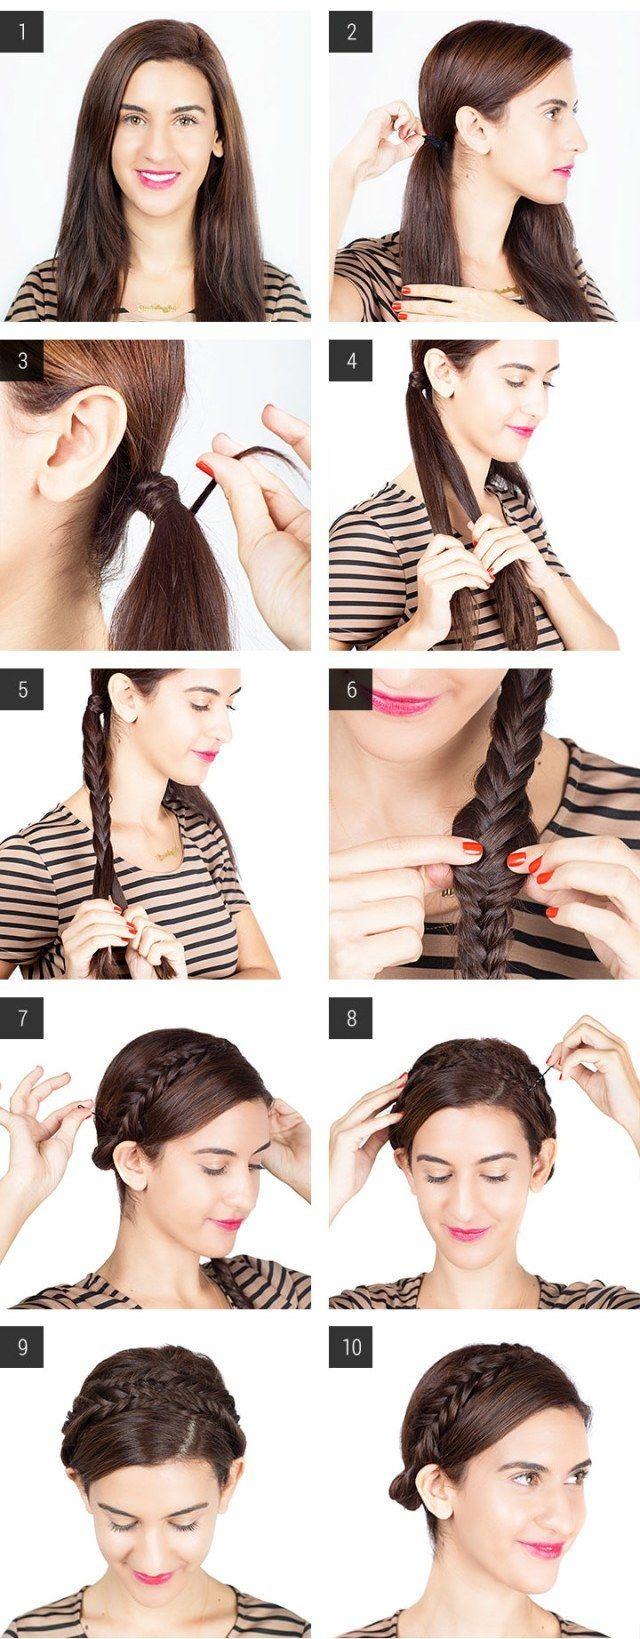 como hacer un peinado facil